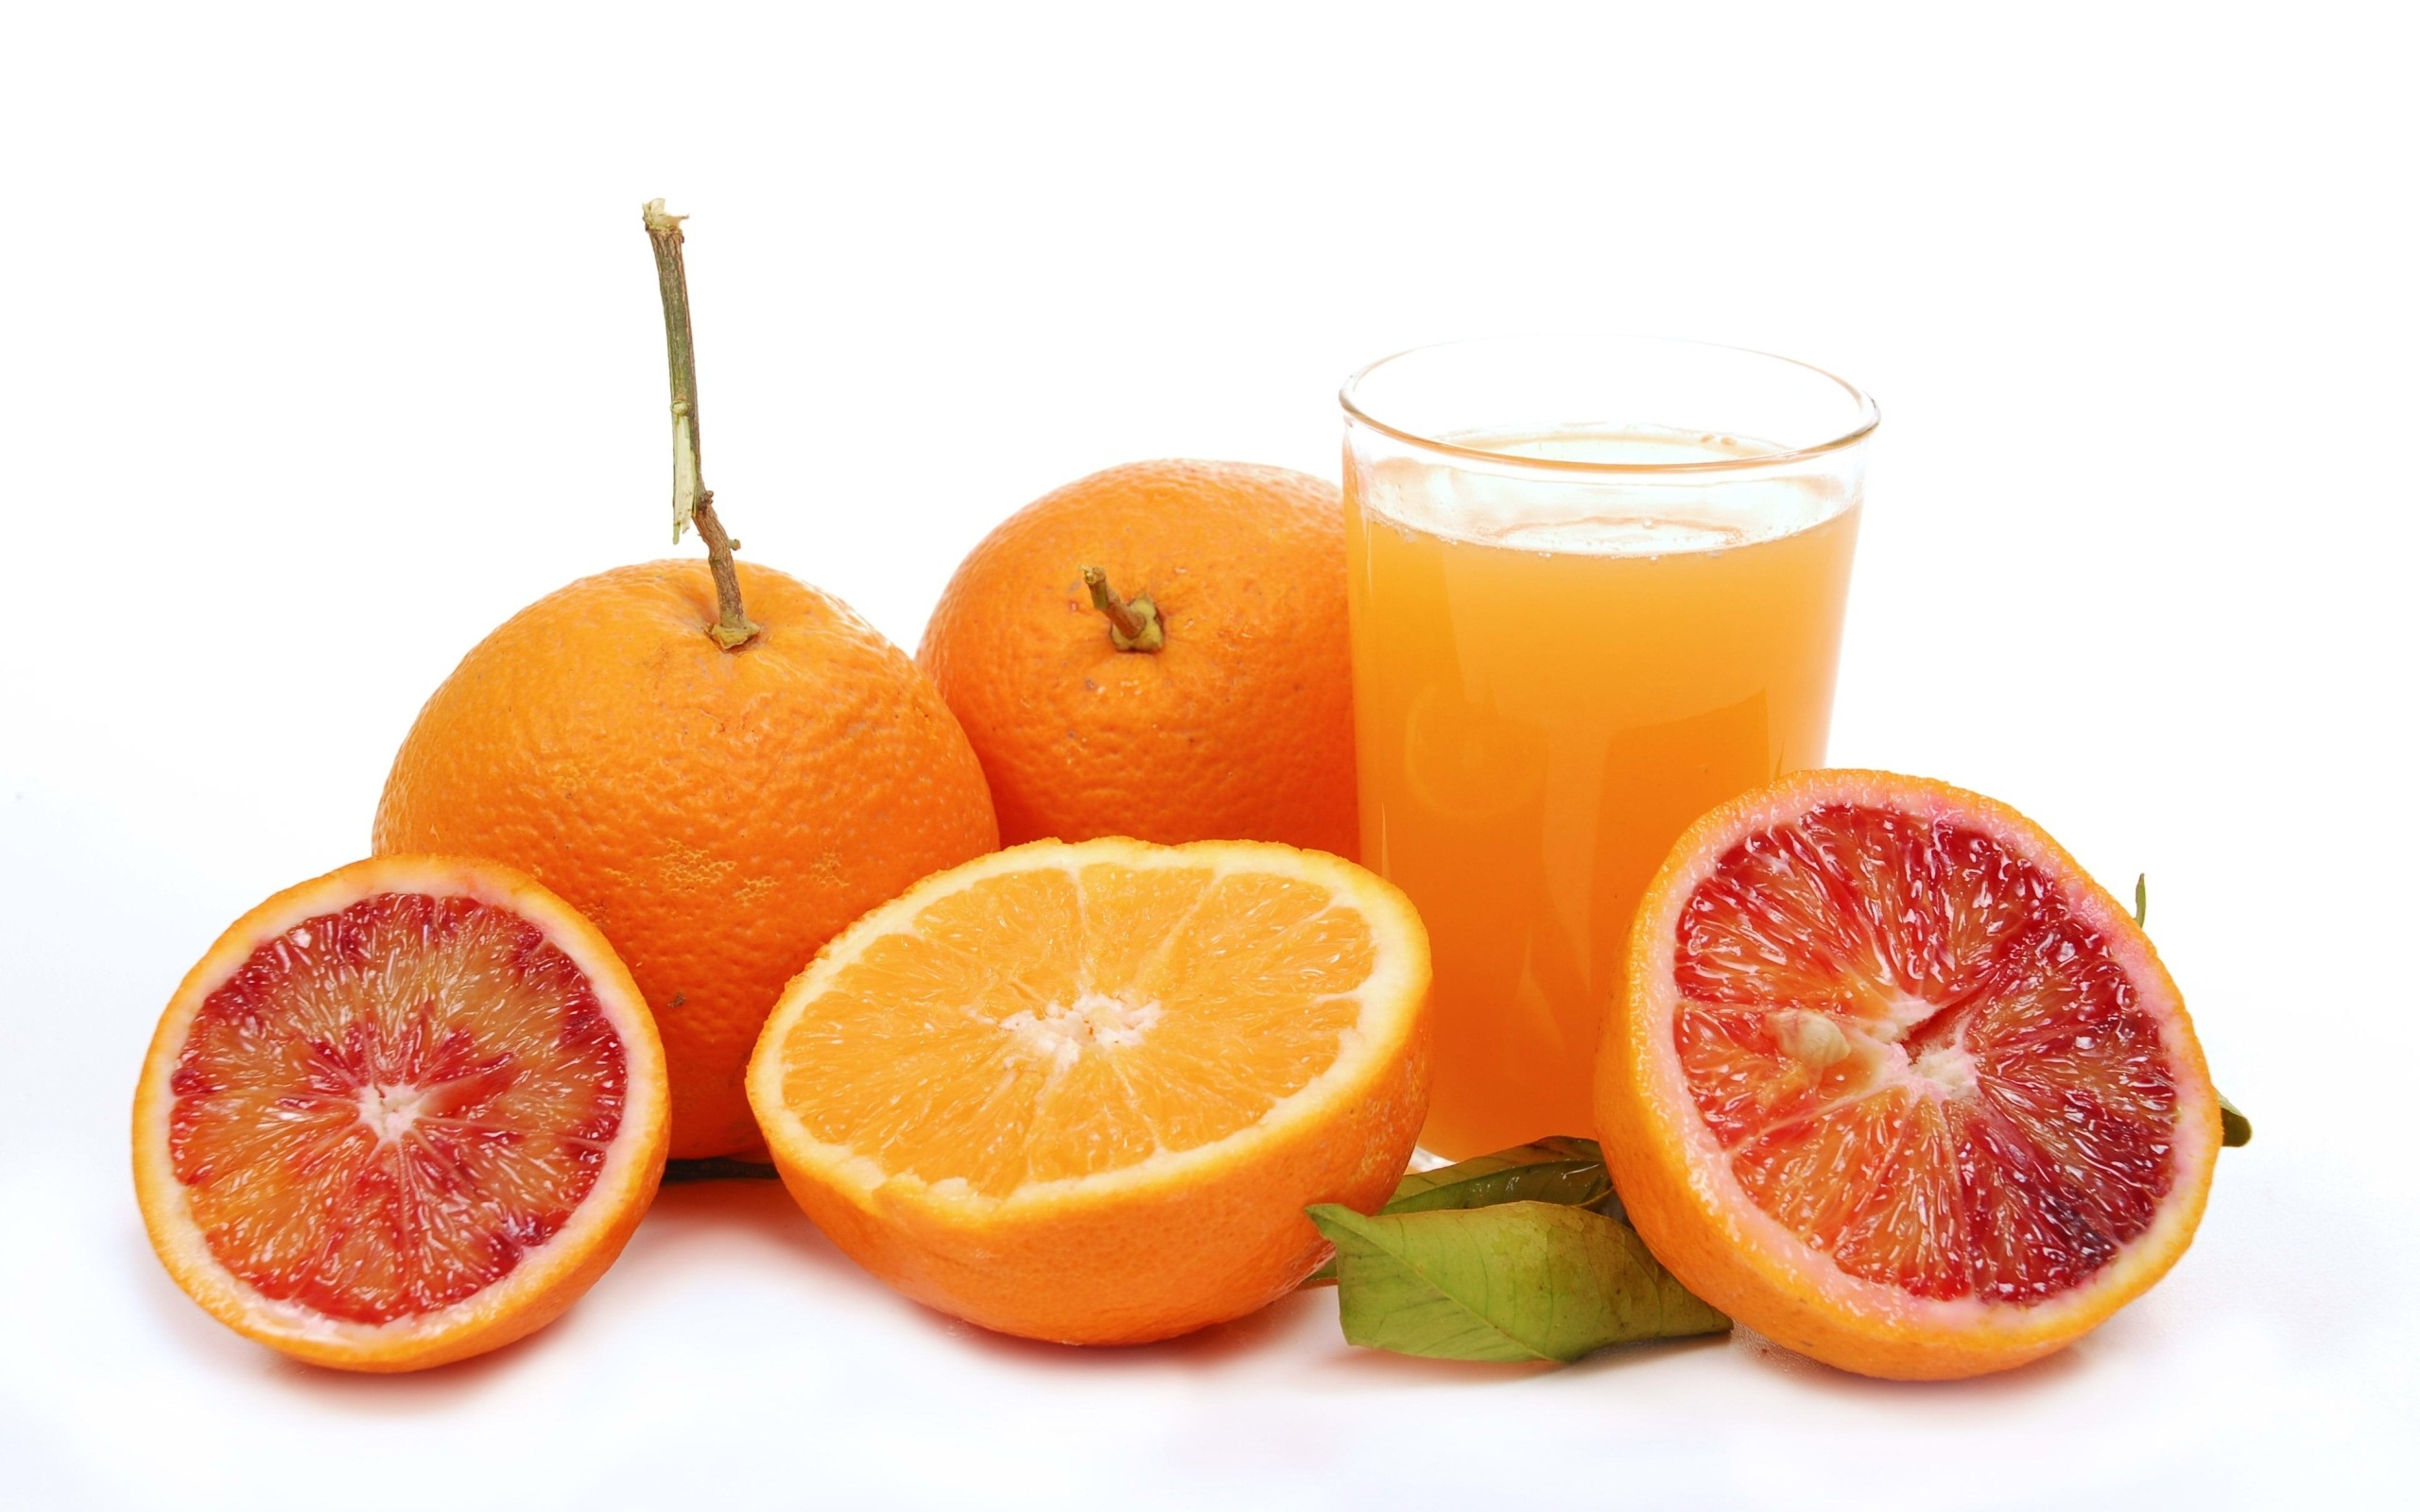 Orange Juice Wallpaper Image 4456 Wallpaper Wallpaper Screen 2560x1600